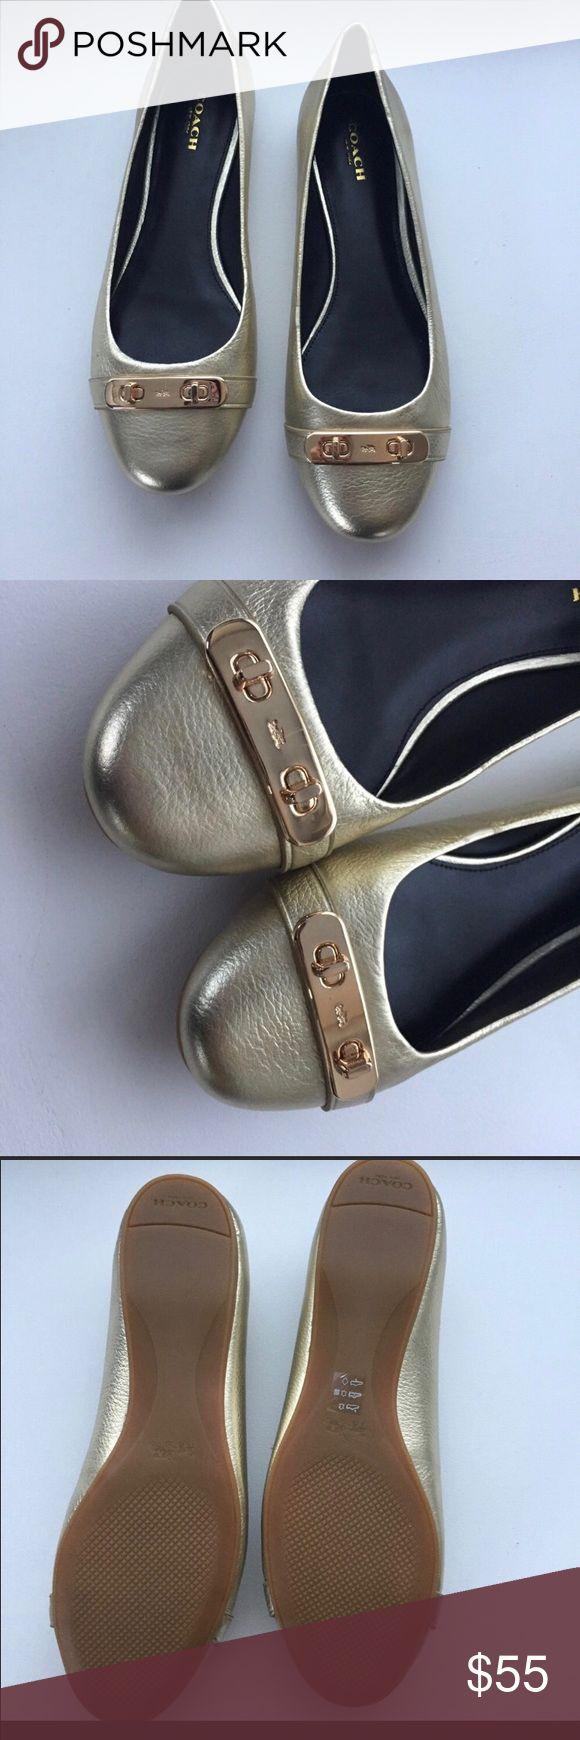 NWOT COACH gold ballet flats. Size 8 NWOT COACH gold ballet flats. Beautiful gold shoe, with gold plate detail. Size 8. Coach Shoes Flats & Loafers